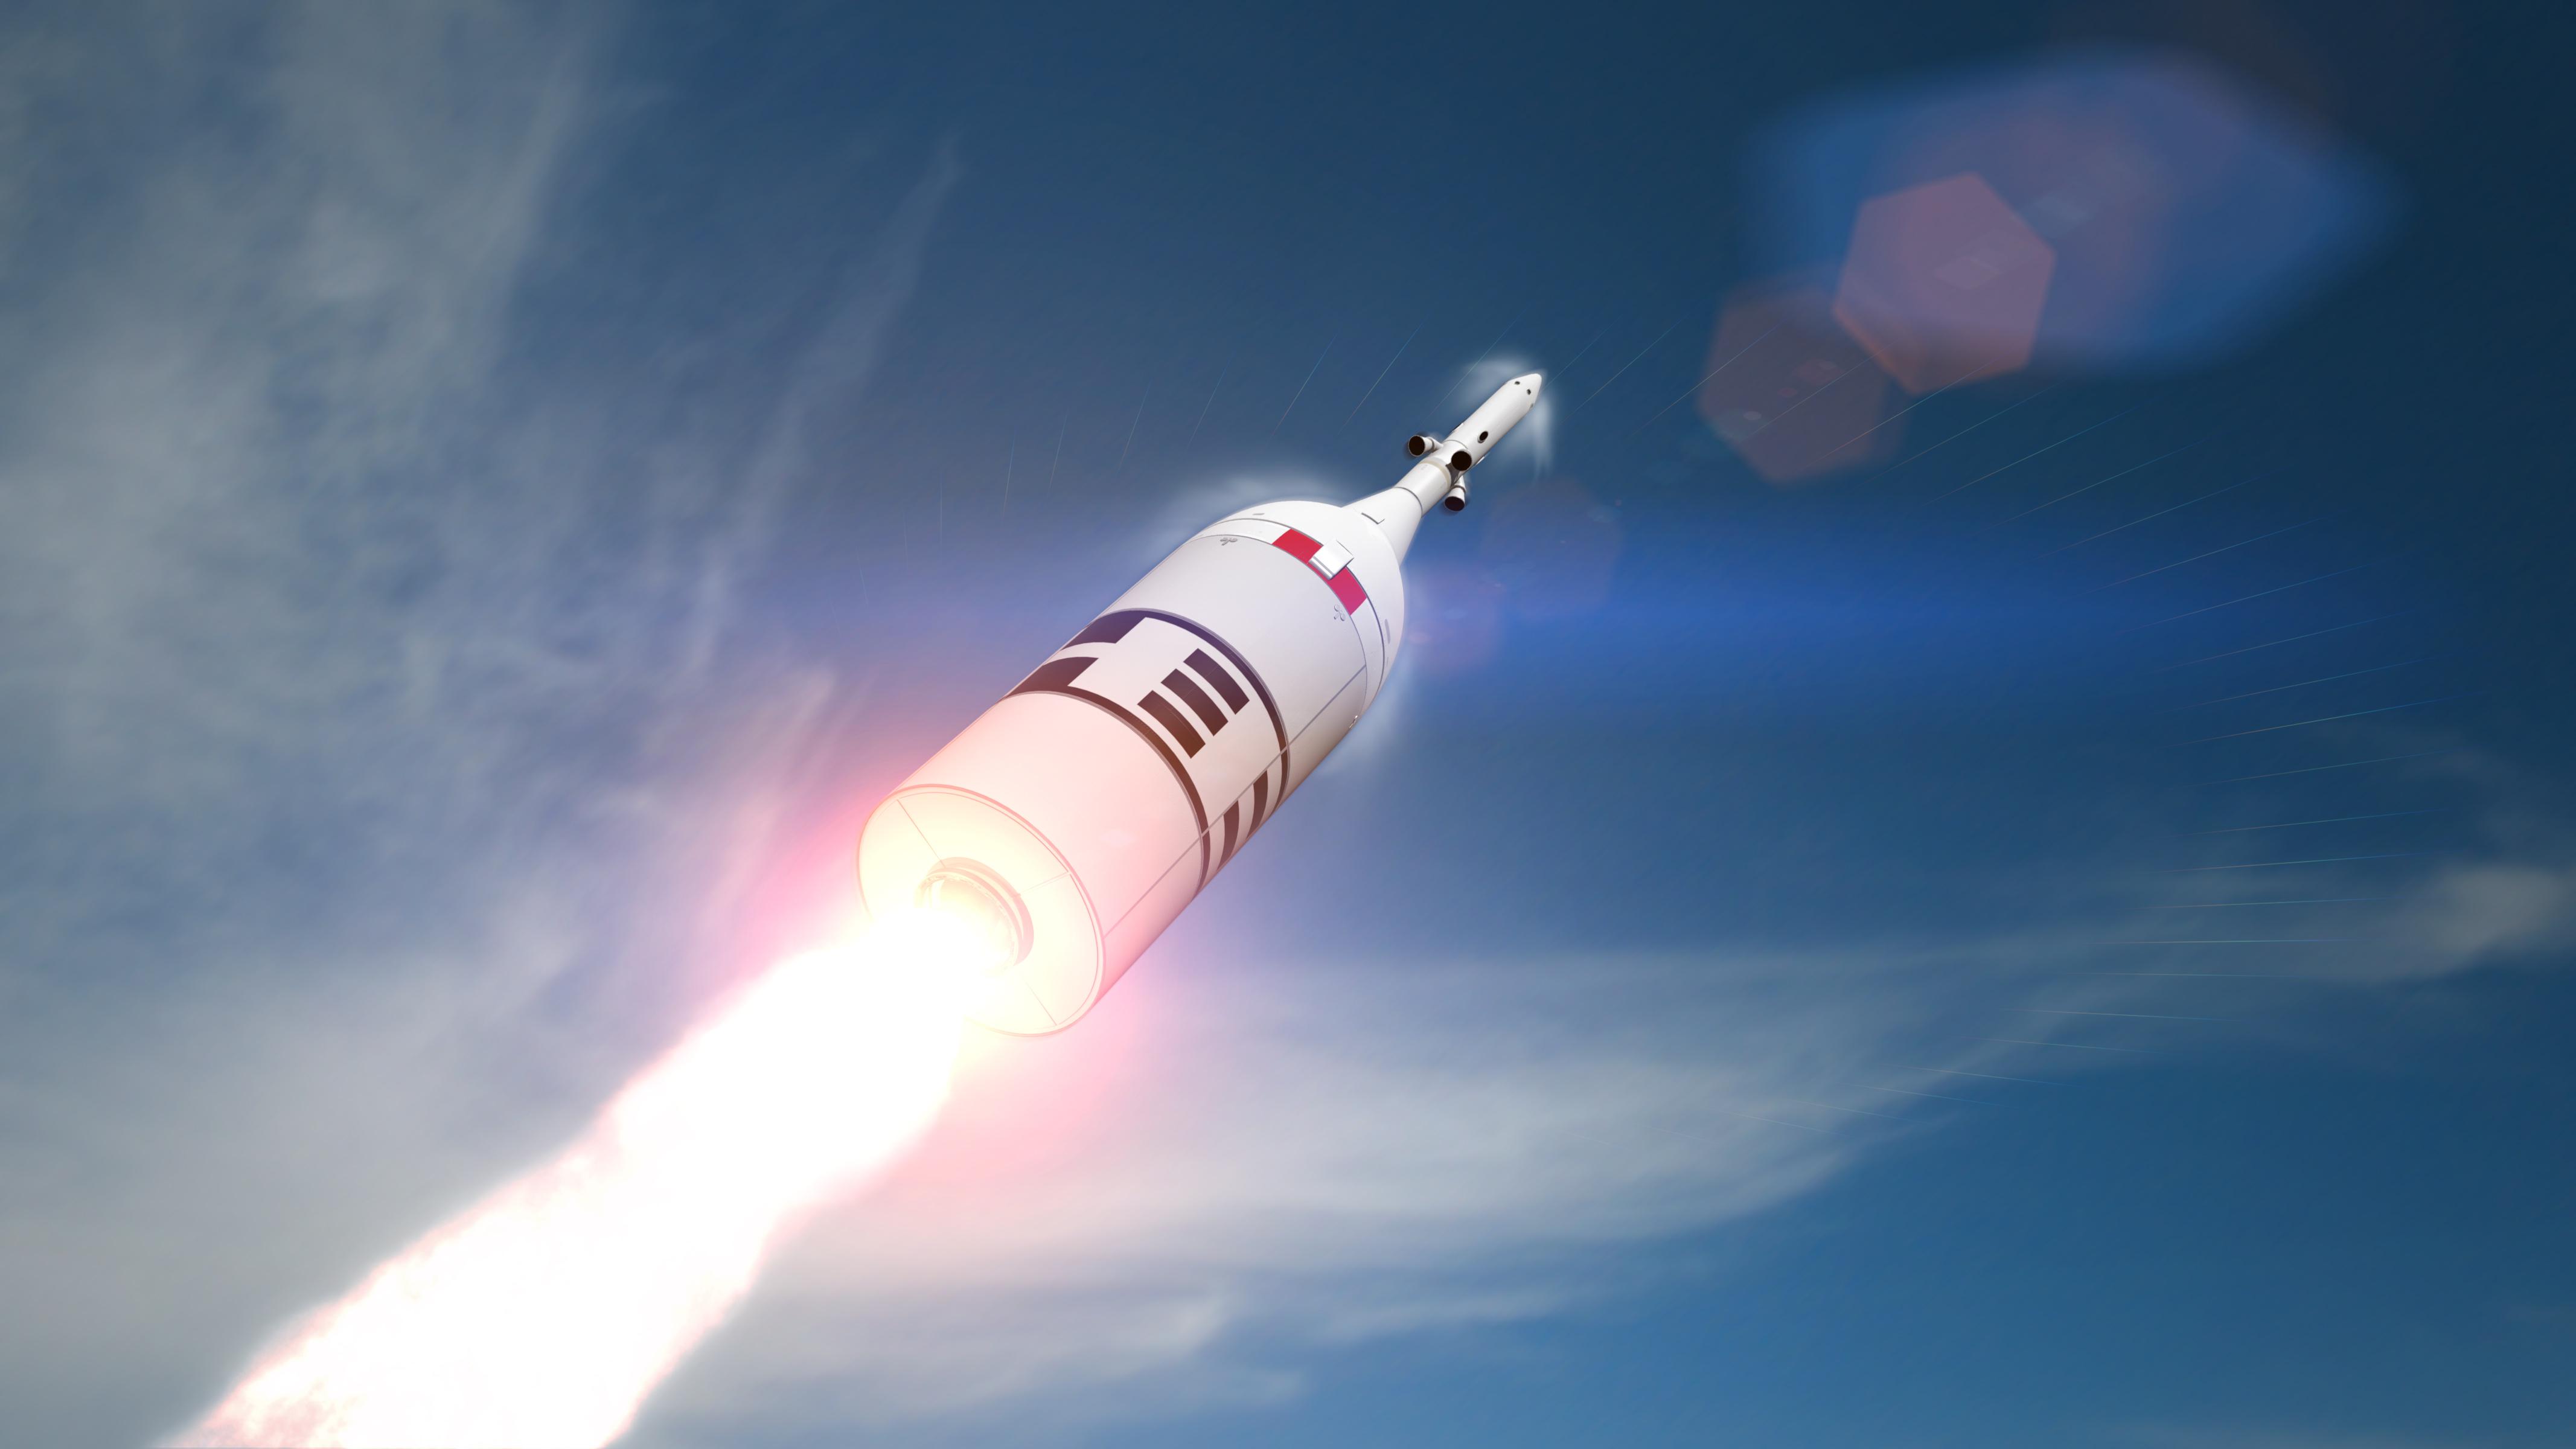 space shuttle navigation system - photo #35